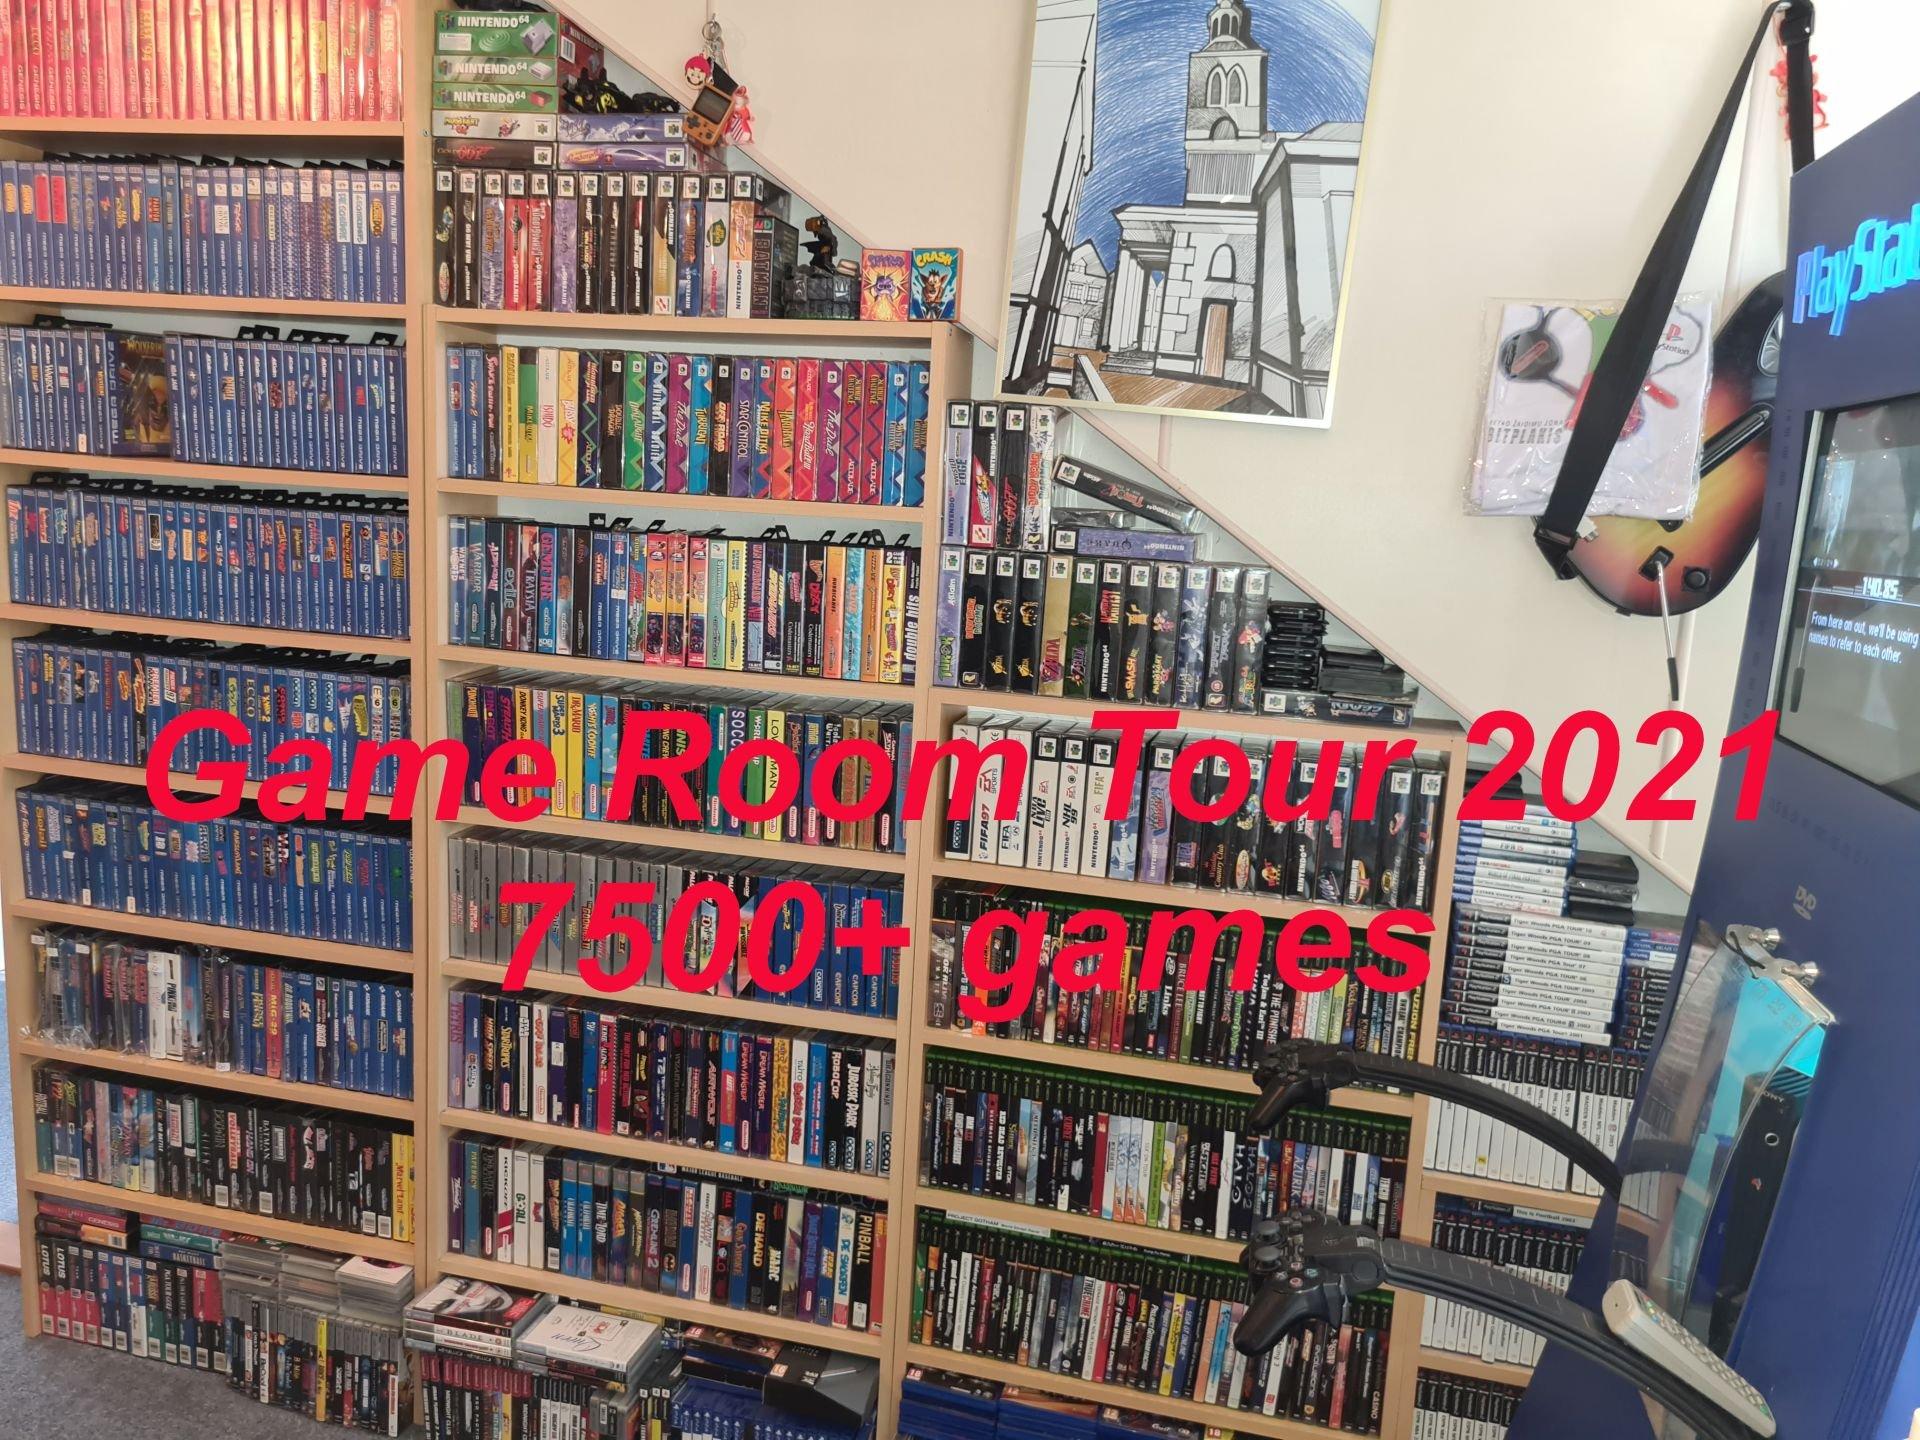 Game Room tour 2021